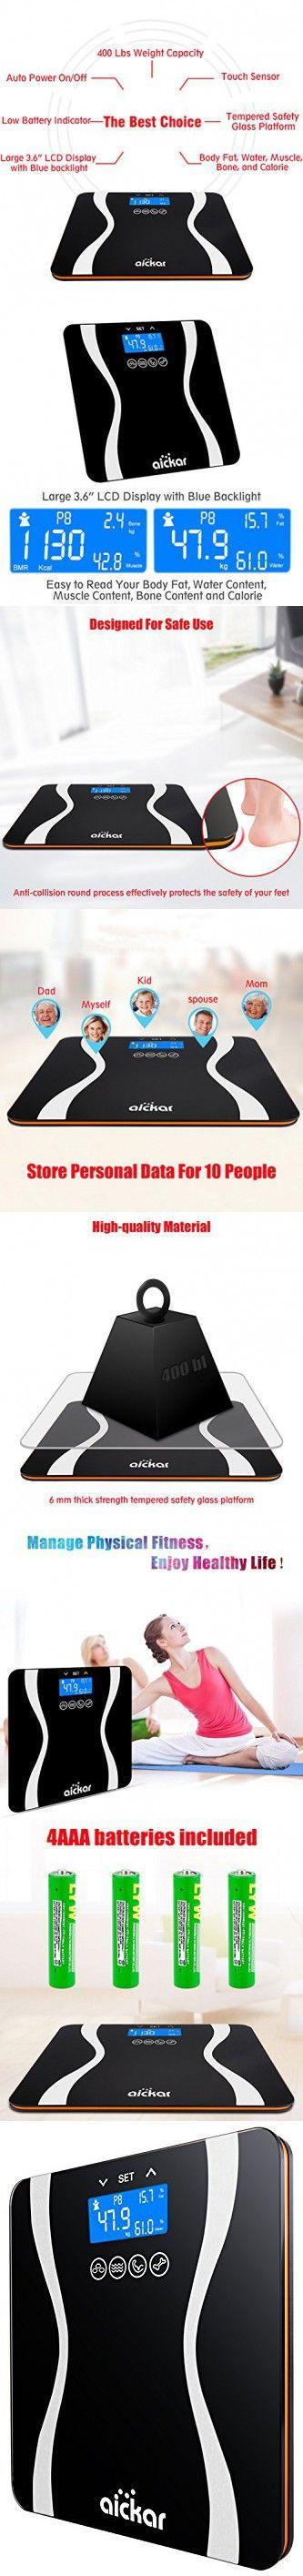 Best Bathroom Scales 2014 - Aickar bathroom scale 400 lbs capacity bathroom scale measures weight body fat water